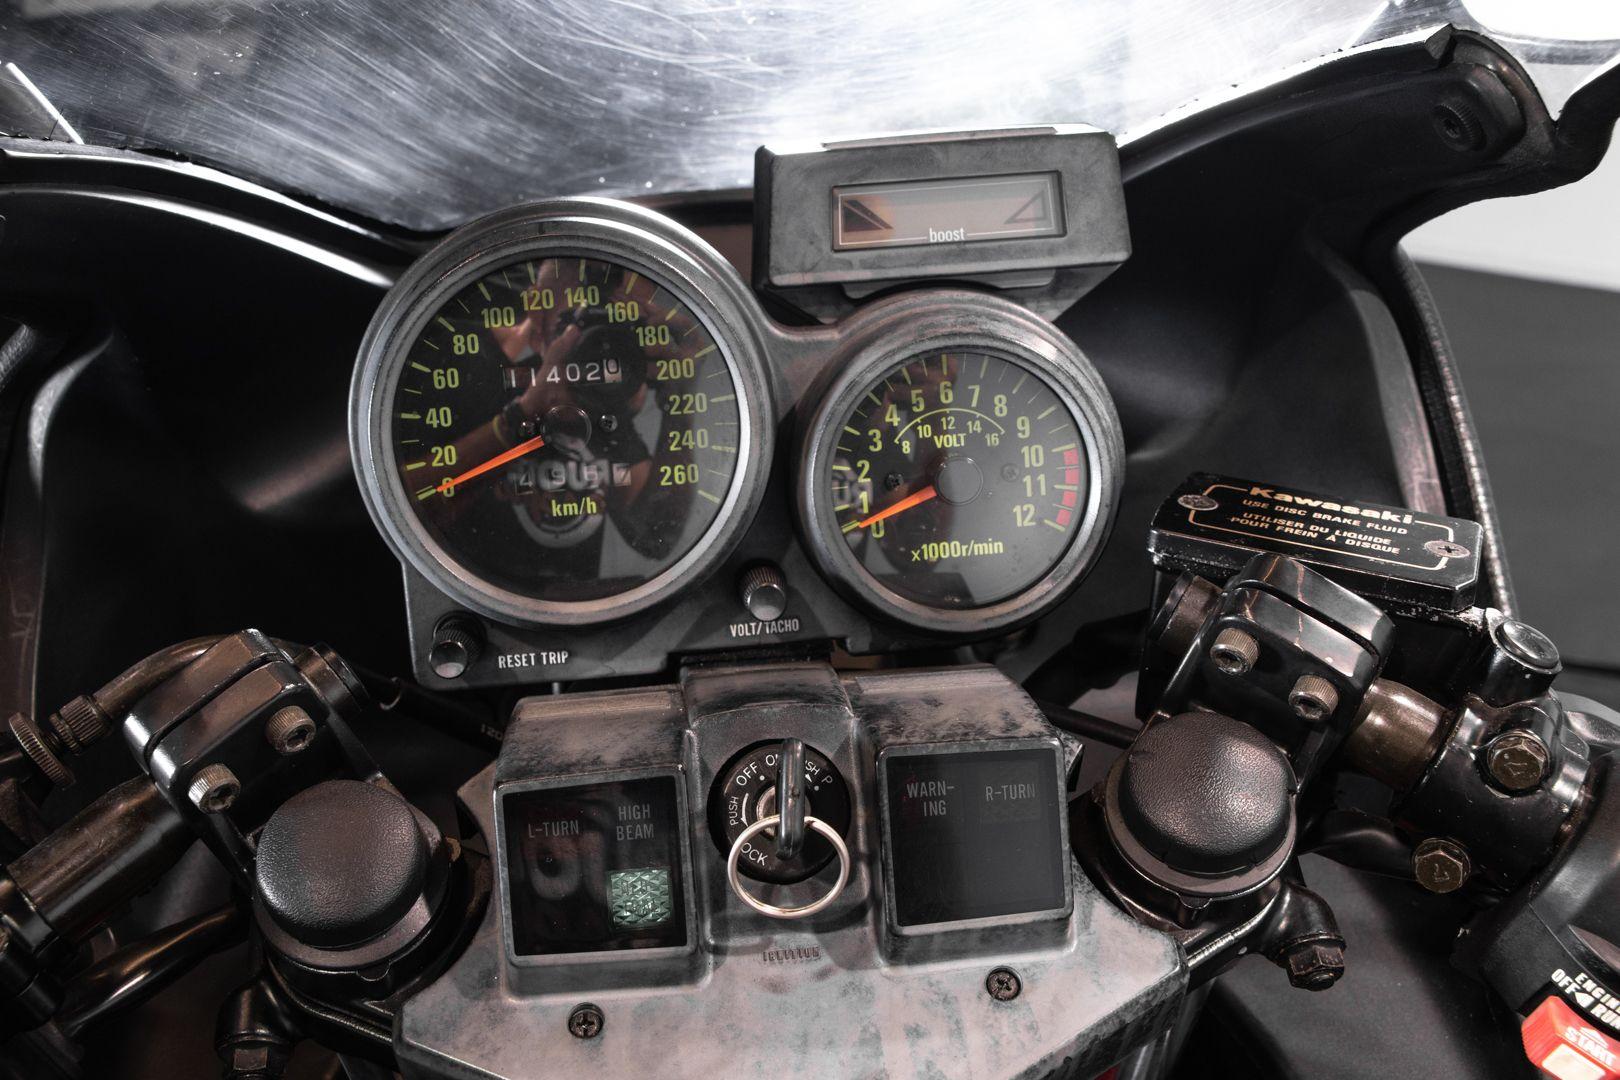 1985 Kawasaki Turbo 750 84982